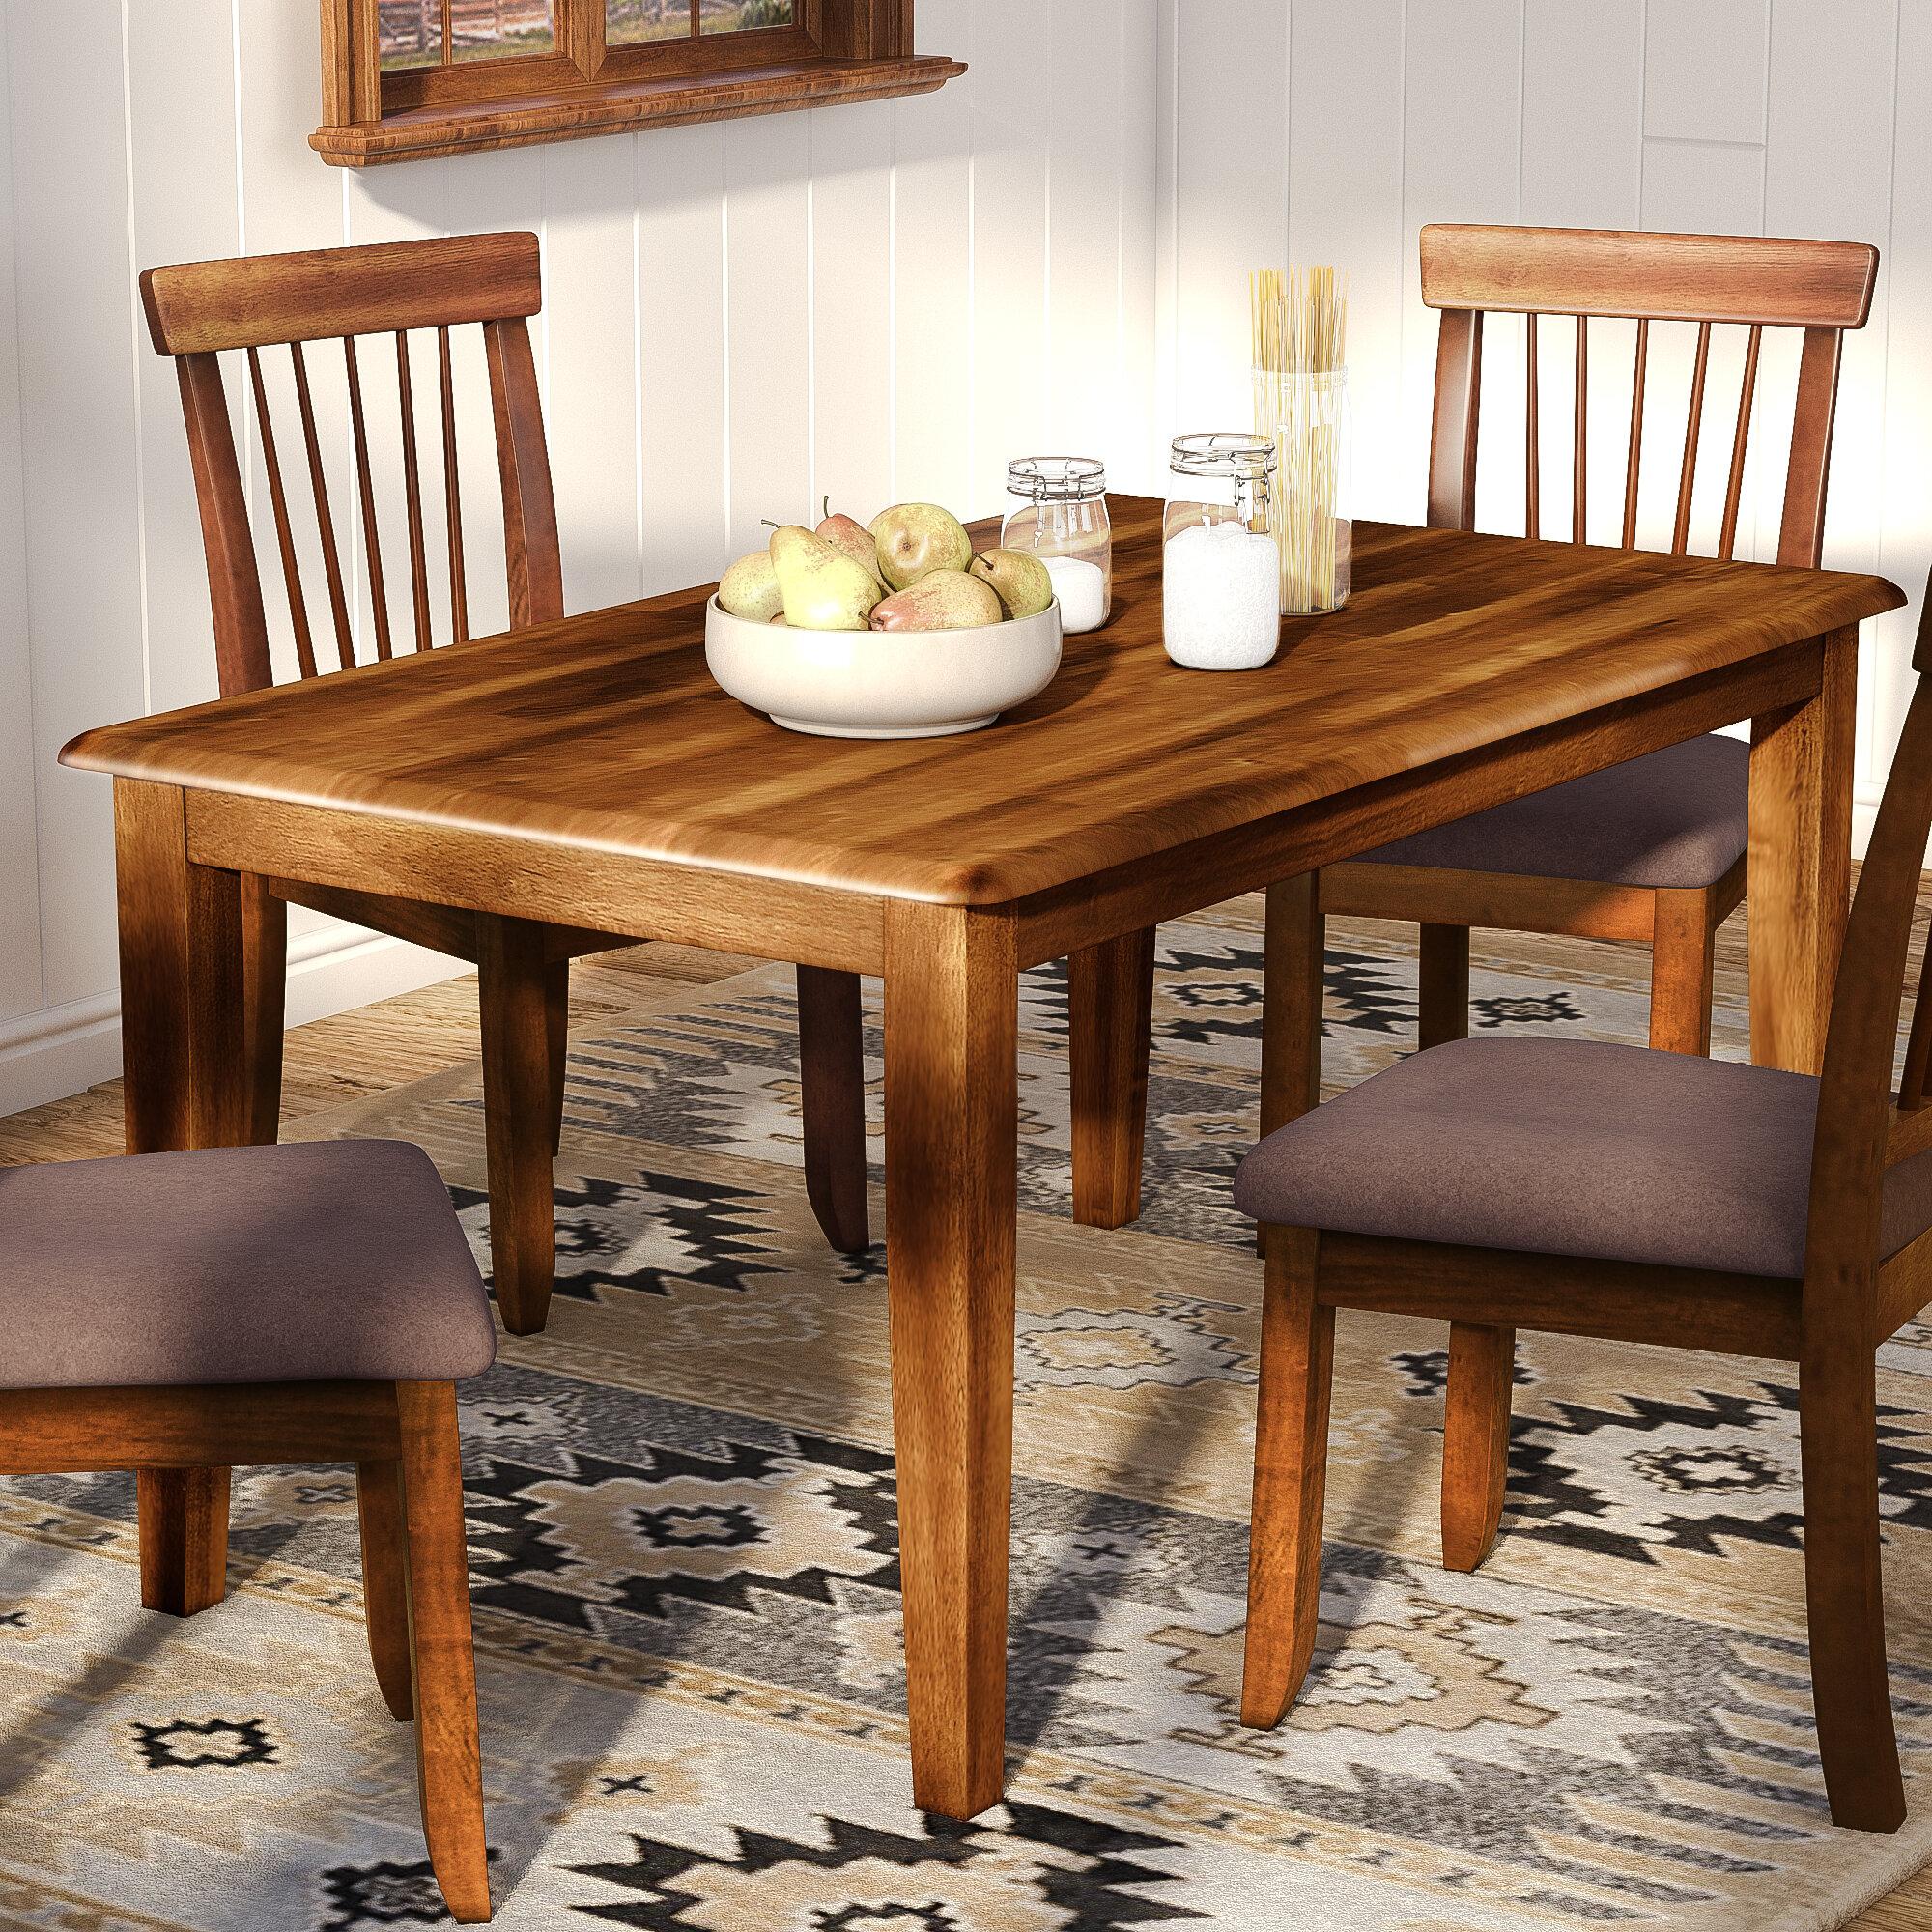 Medium Kitchen & Dining Room Sets You'll Love in 9   Wayfair